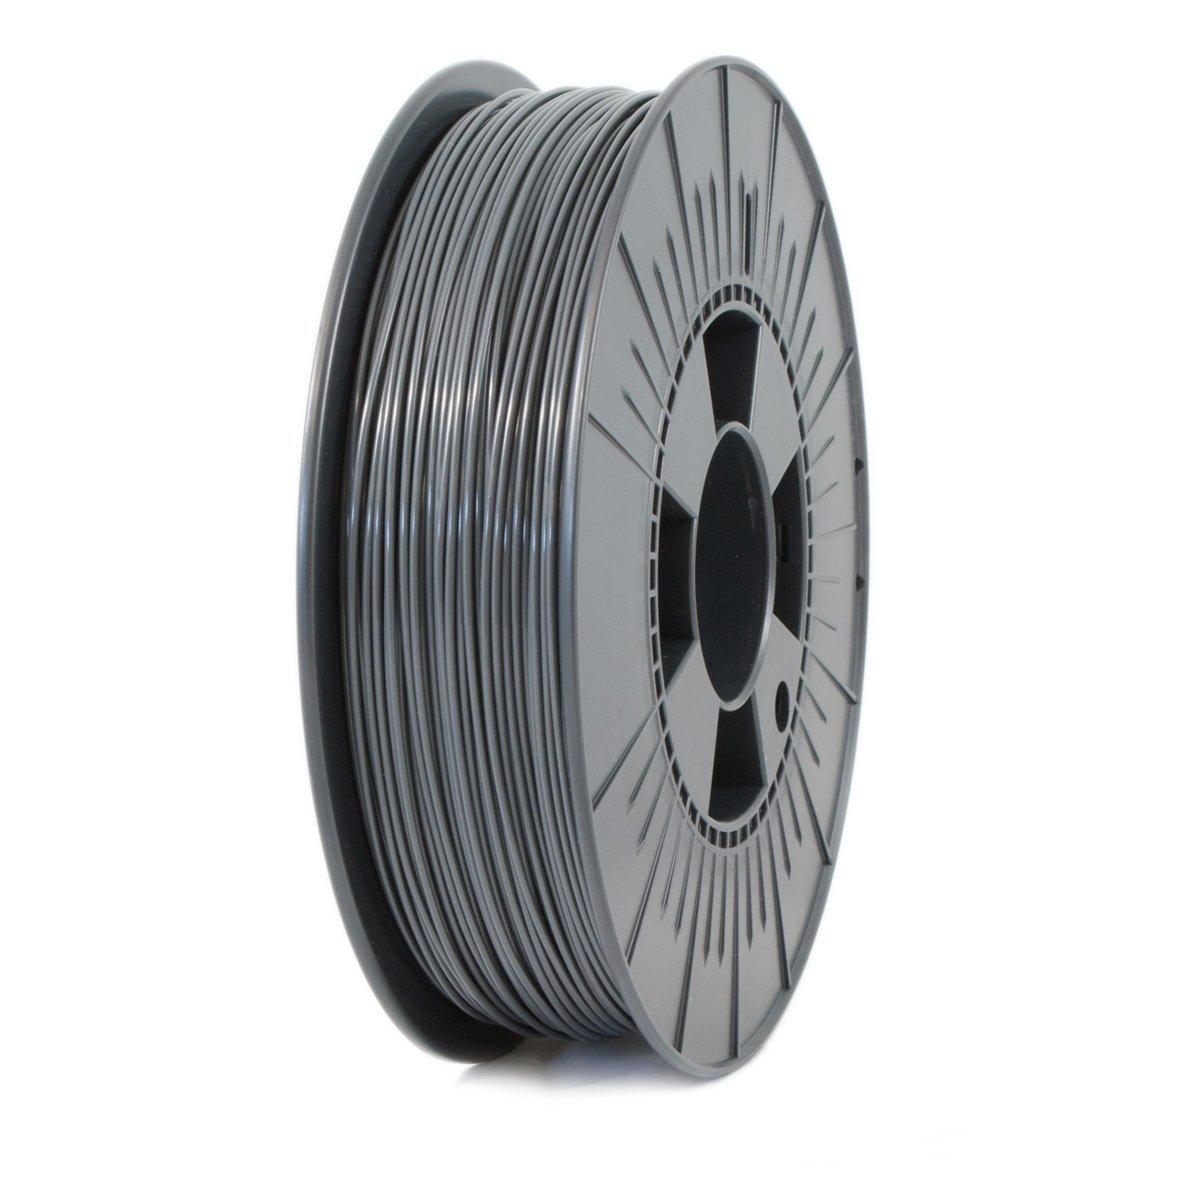 Ice Filaments  Gentle Grey PLA 2.85 mm